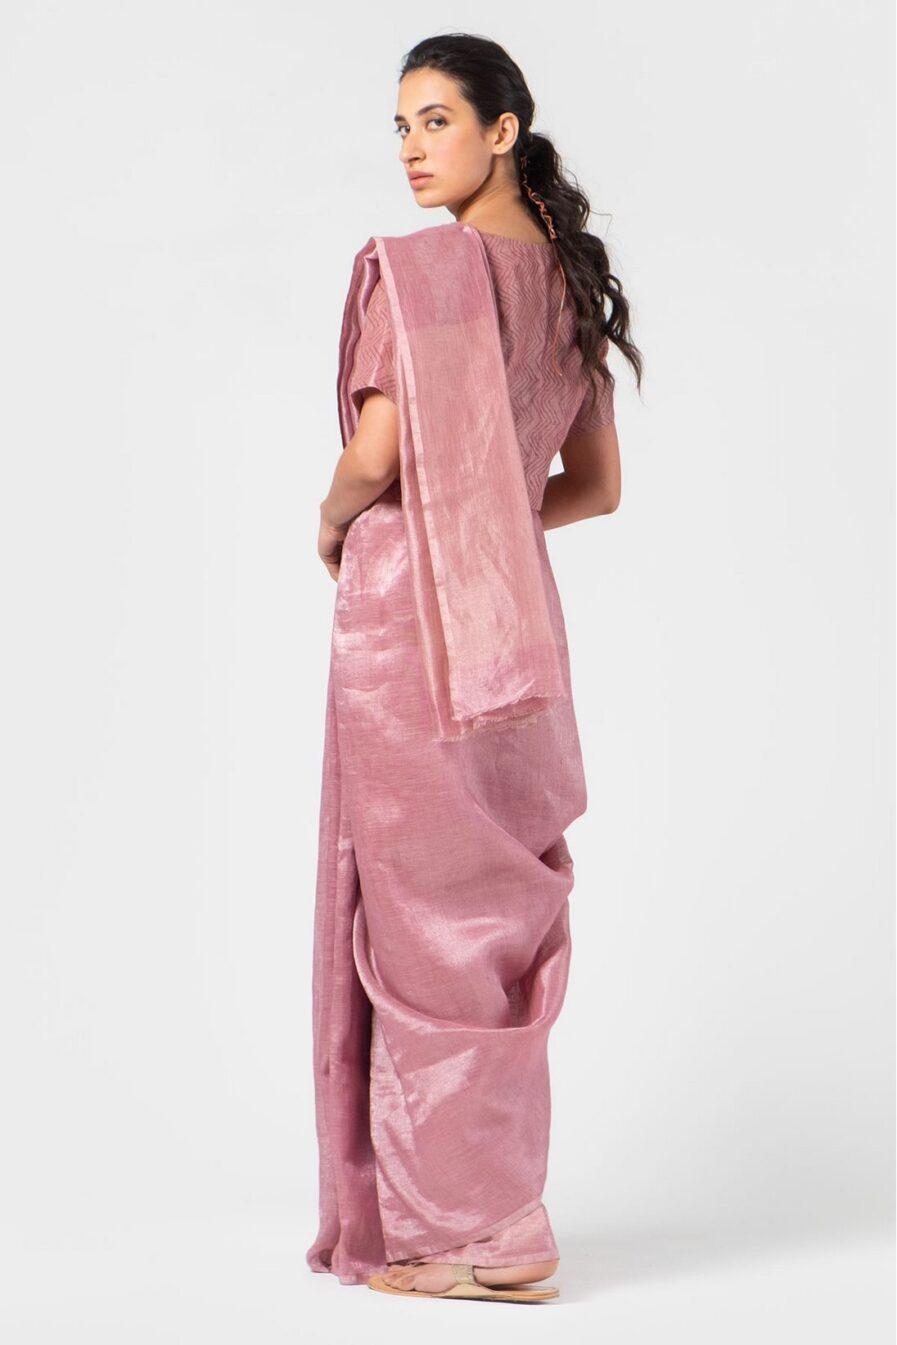 Anavila Dark thulian soft mauve metallic sari